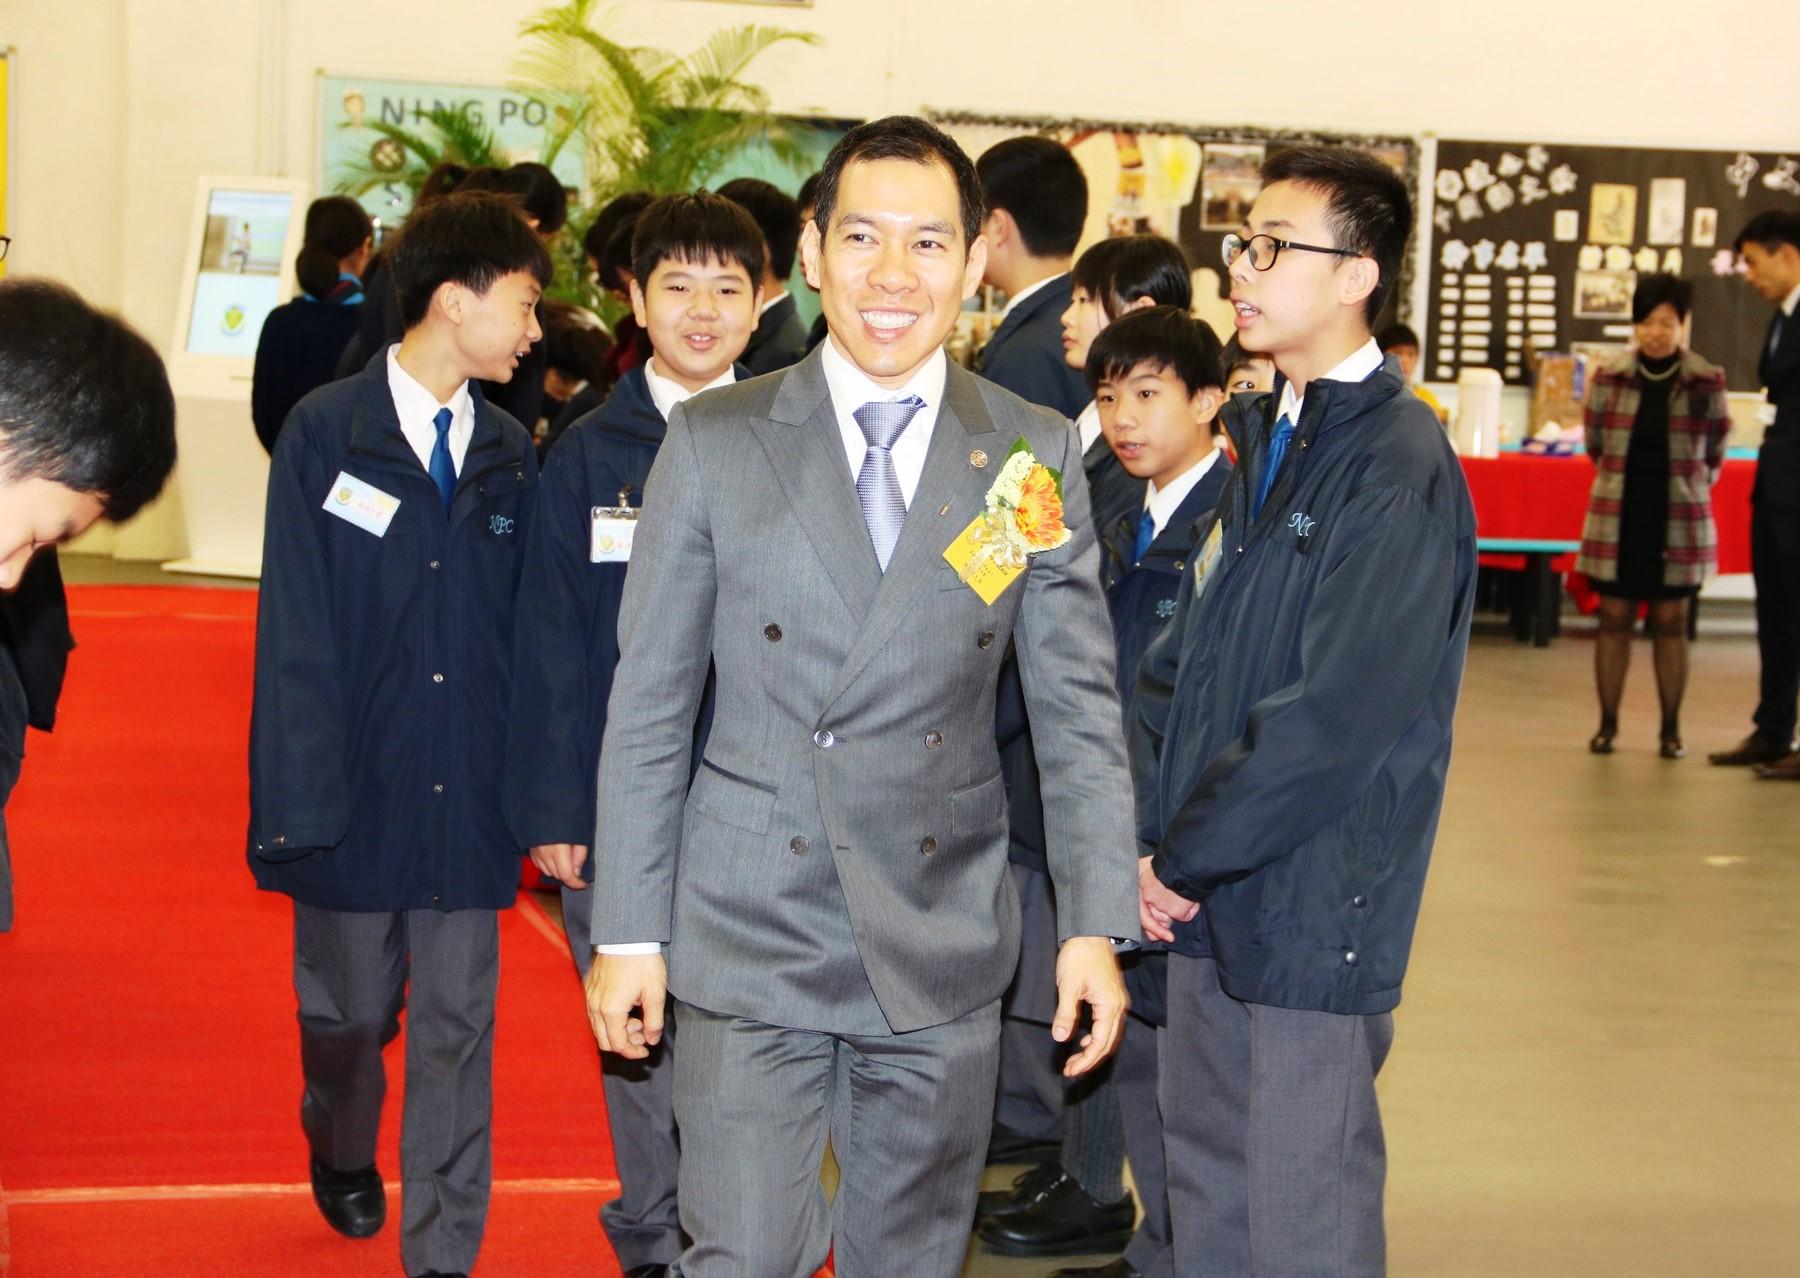 http://npc.edu.hk/sites/default/files/img_7015_1.jpg